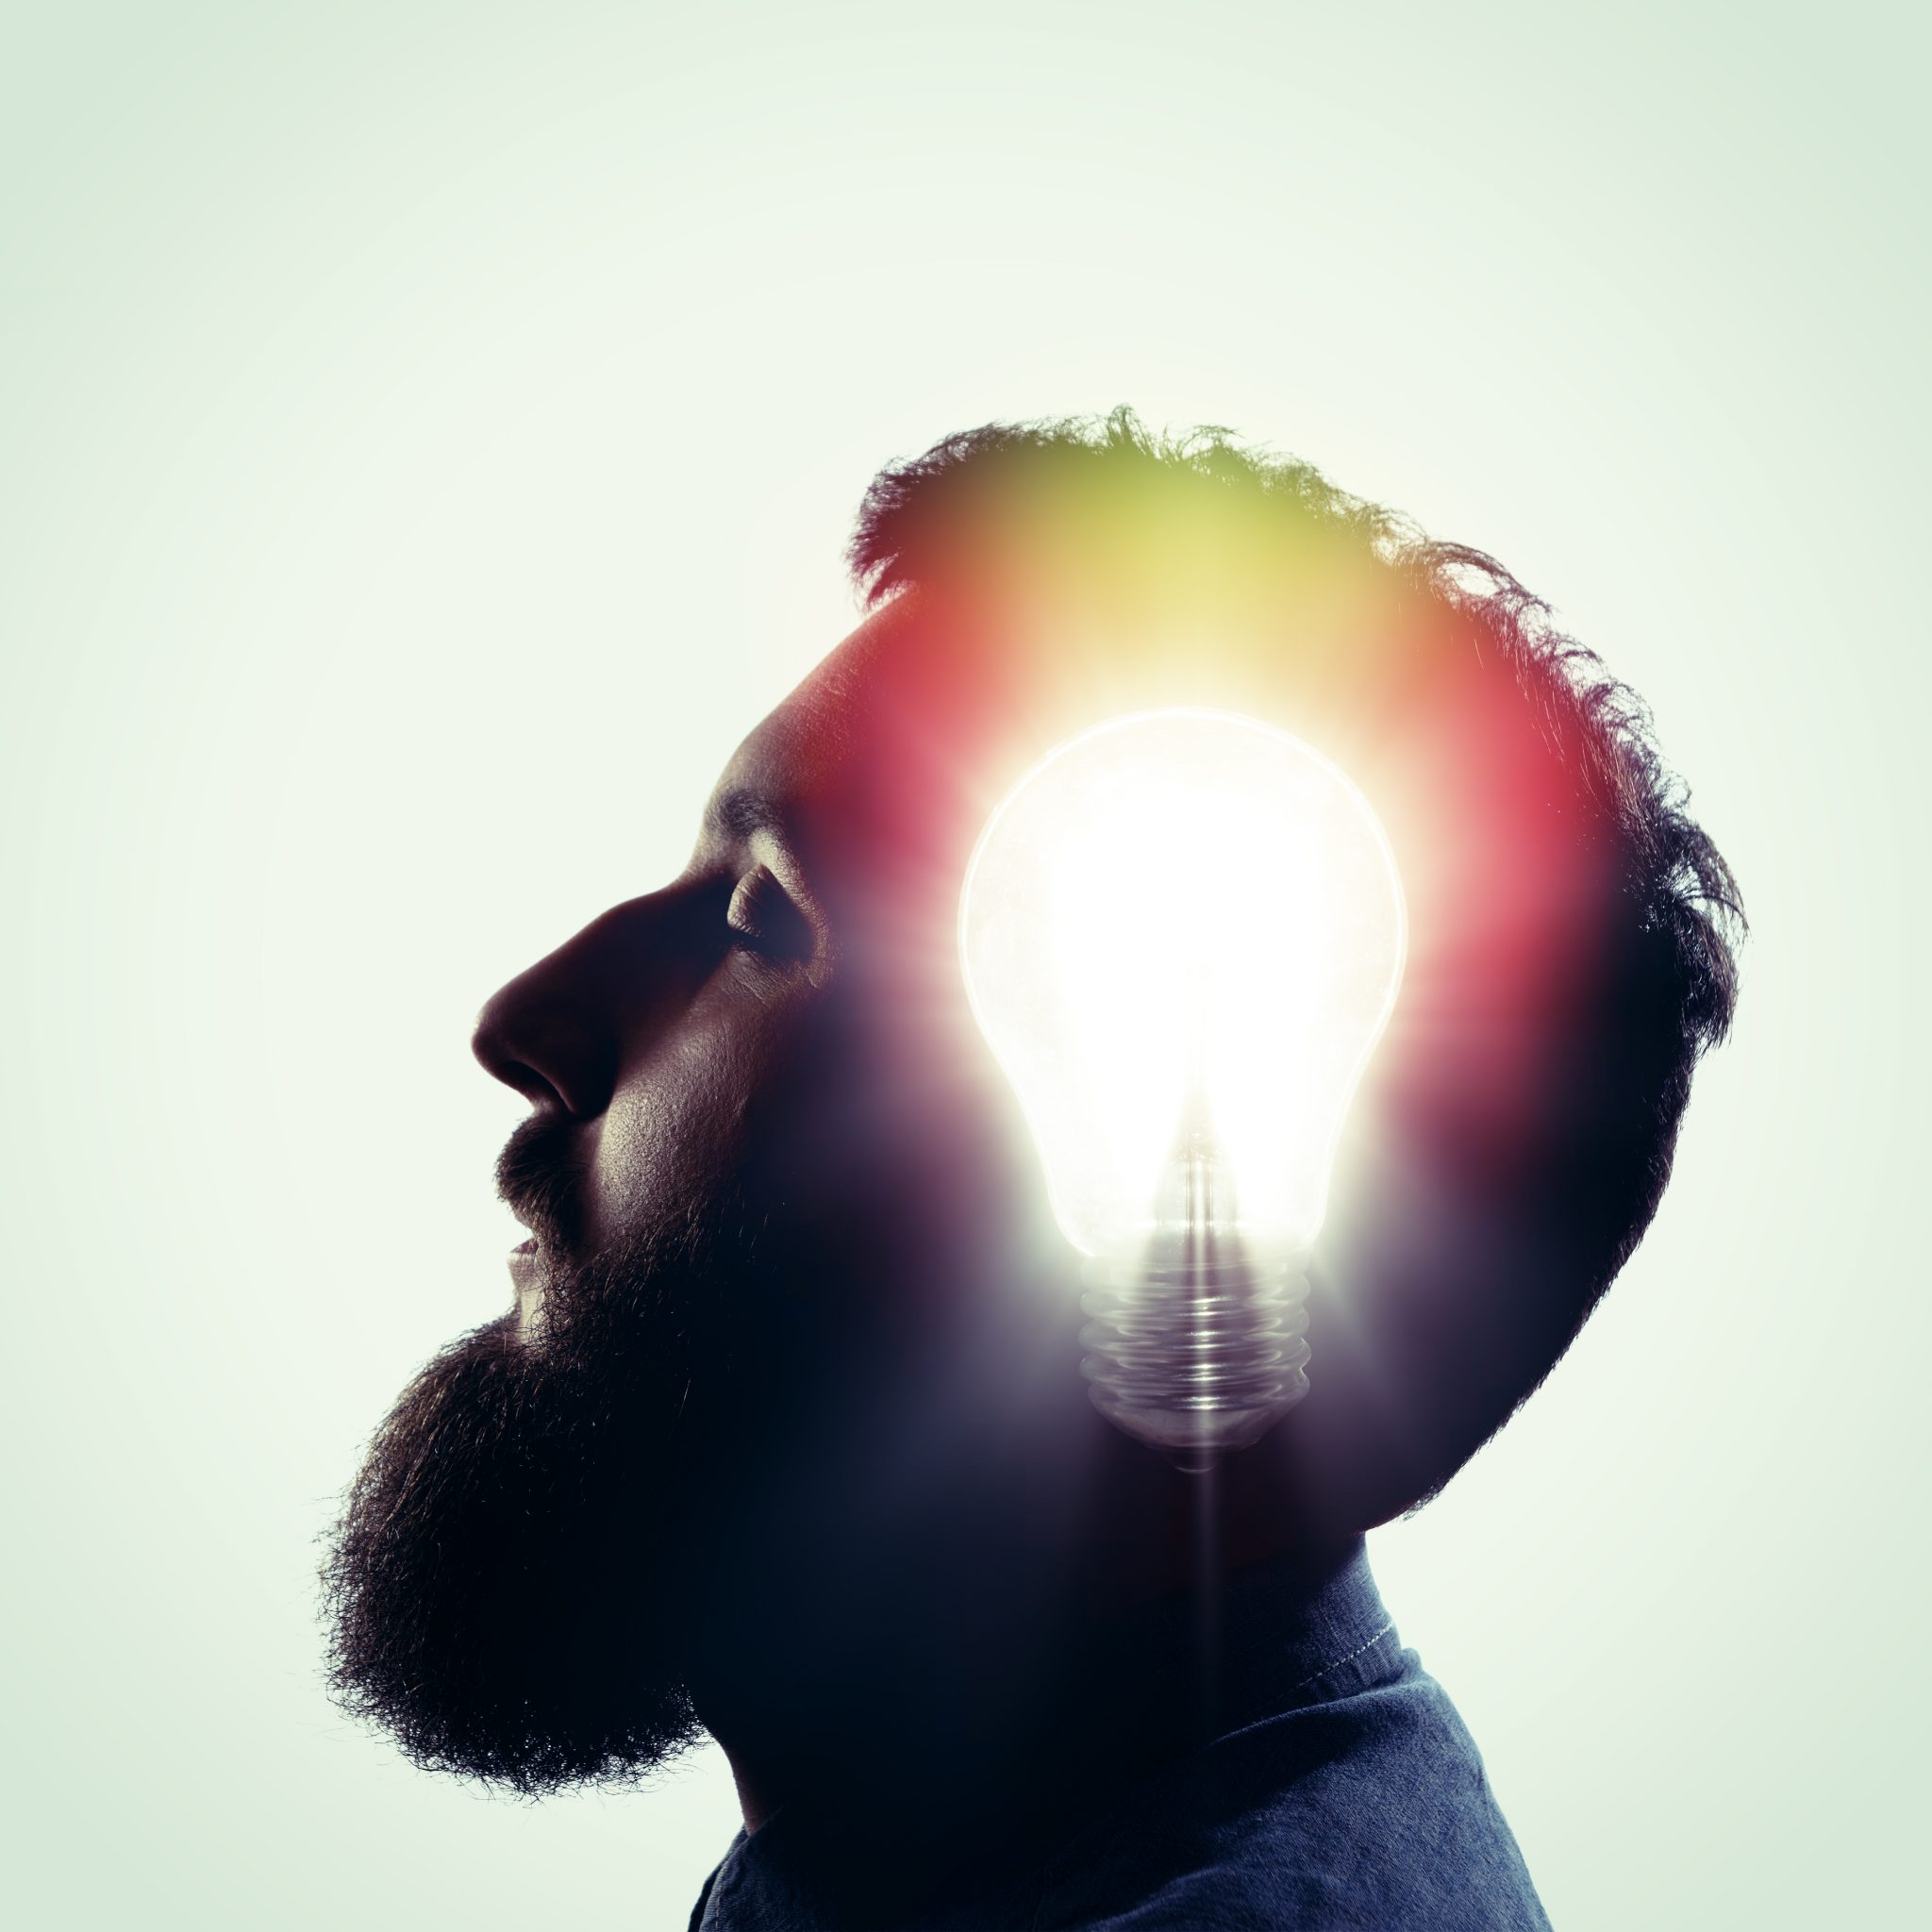 The concept of a new idea.